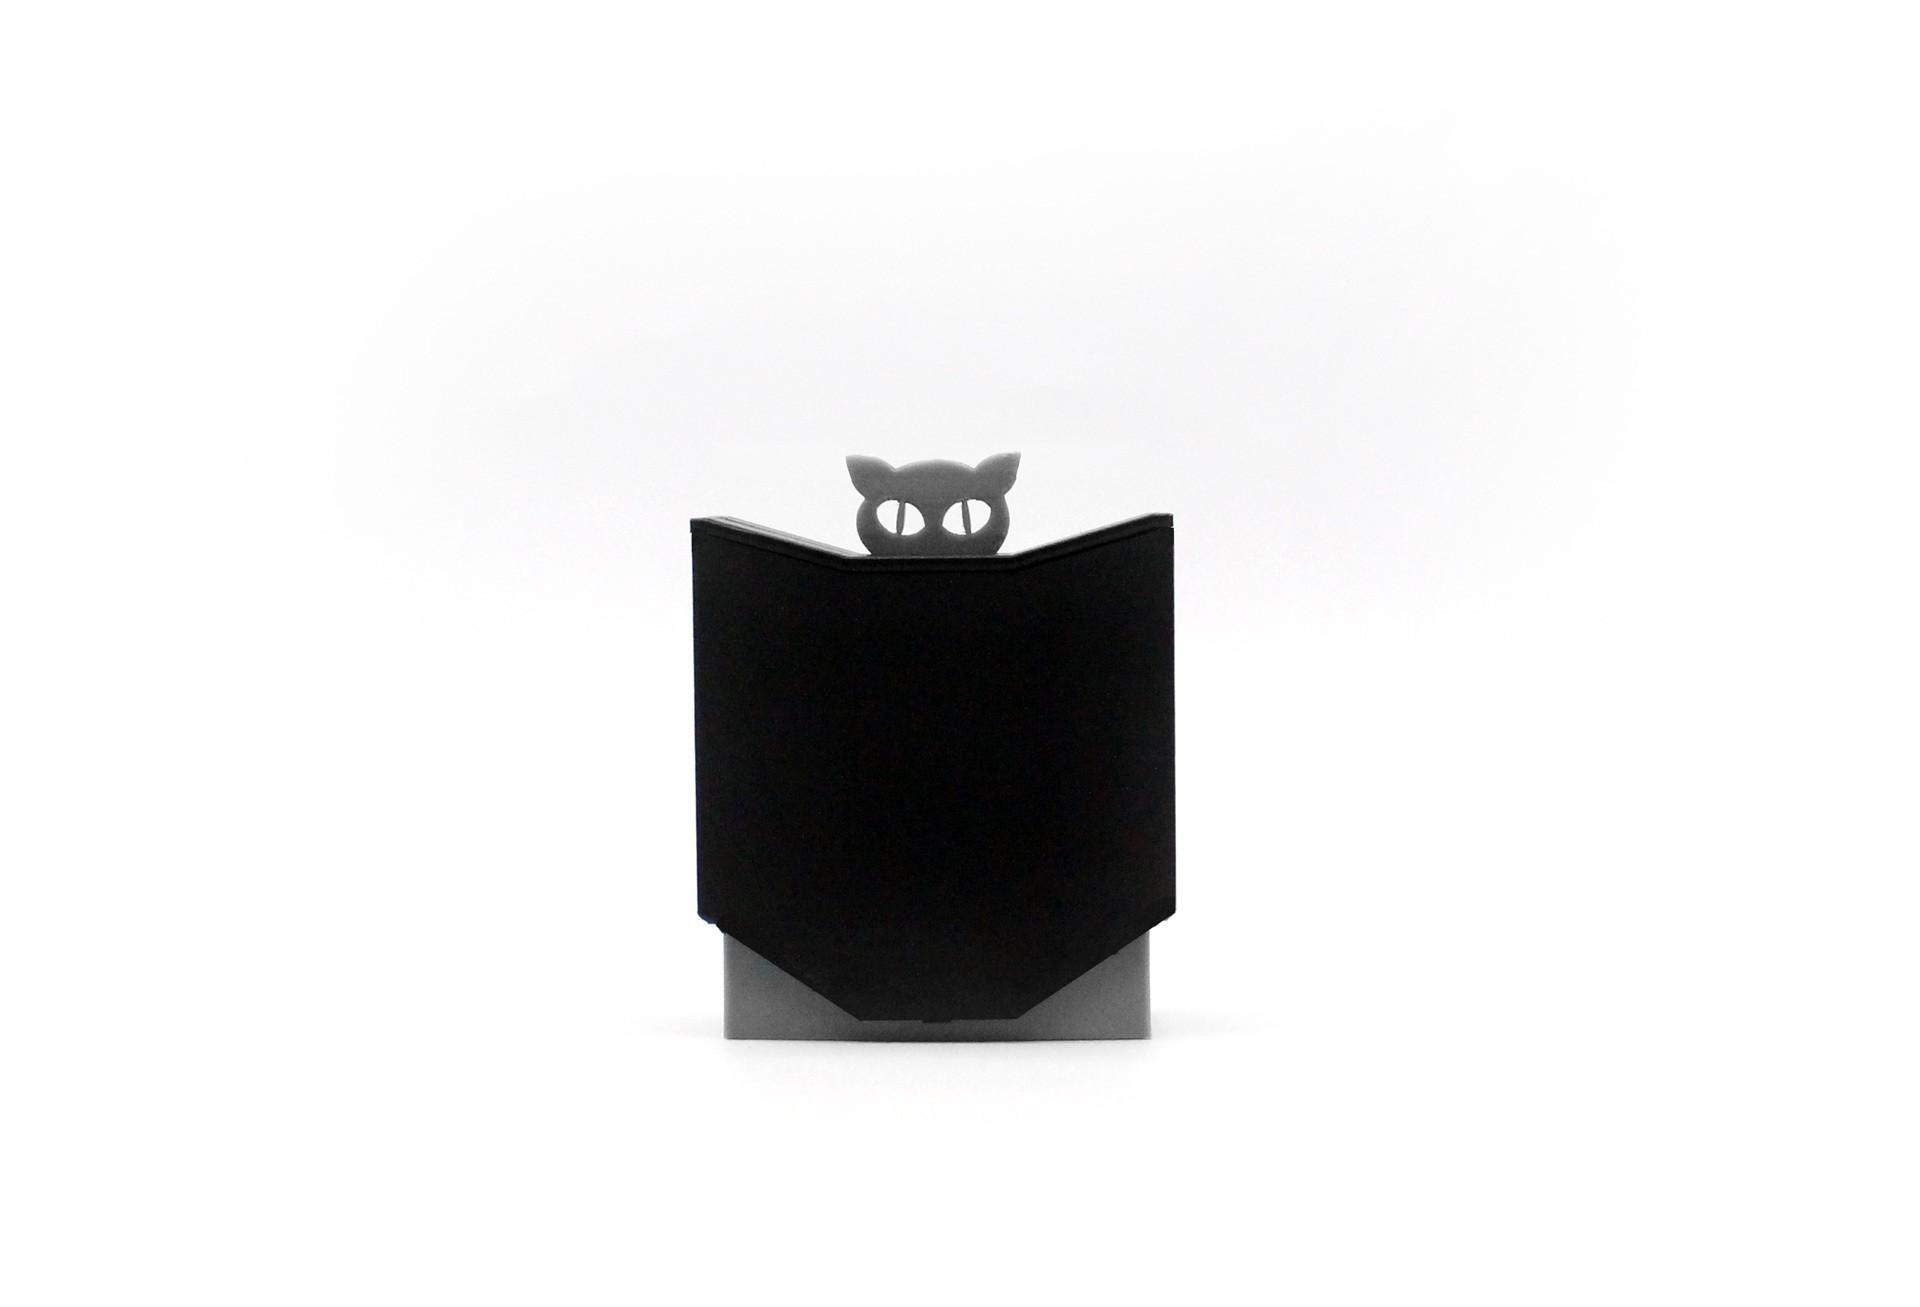 boite_magique_curedent_3dpocket_1.jpg Download STL file Magic toothpick dispenser • Object to 3D print, ffmicka